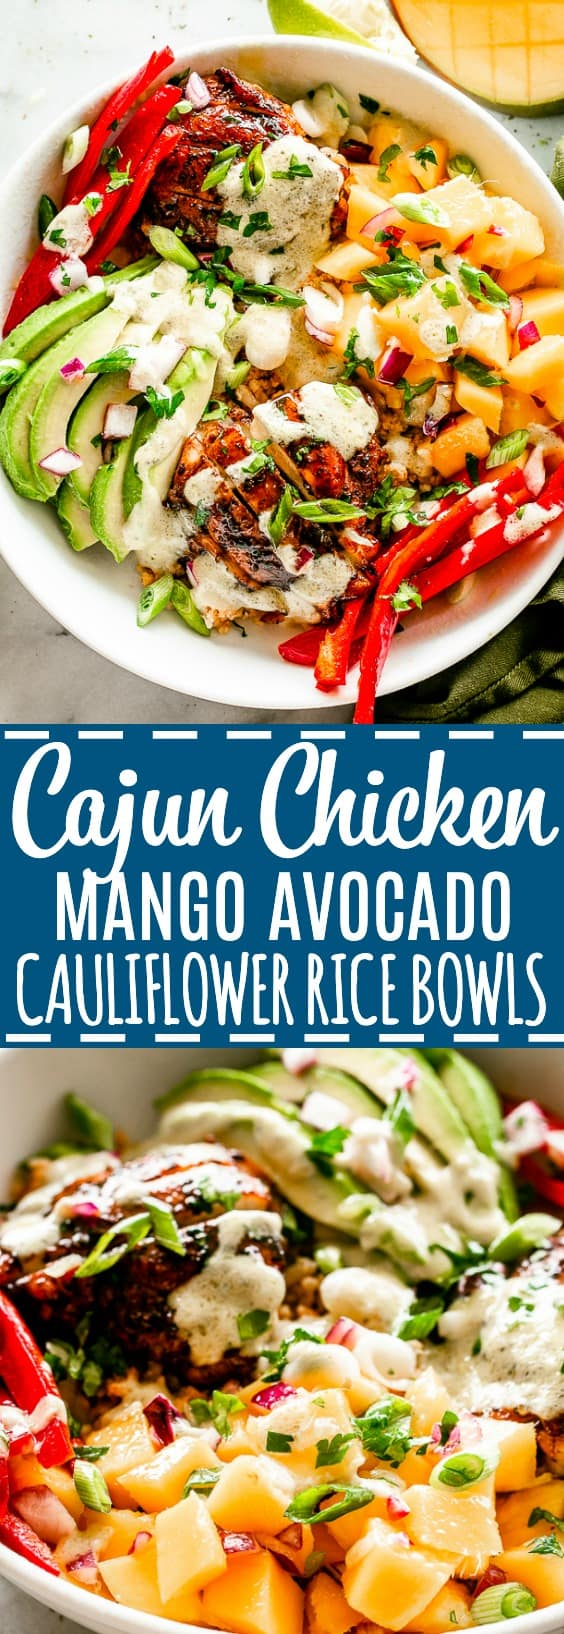 Chicken Cauliflower Rice Bowls Pin Image